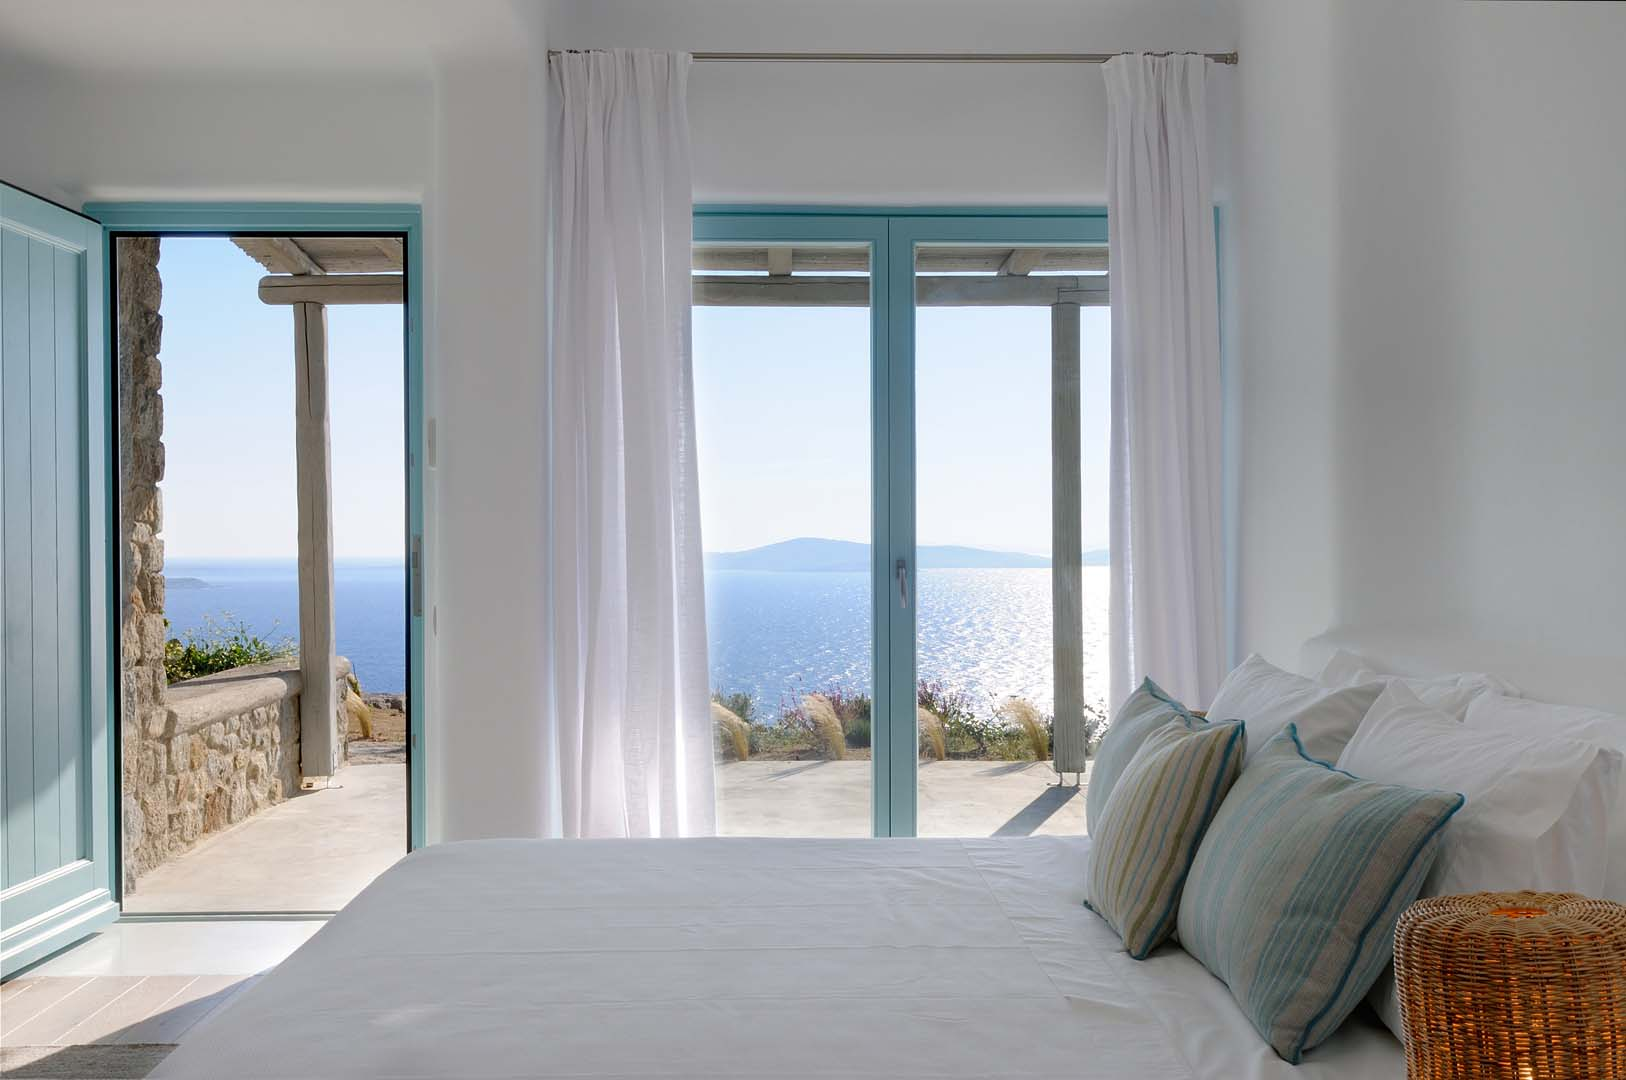 Luxury Villa Artemis 1 your escape bespoke travel (10)